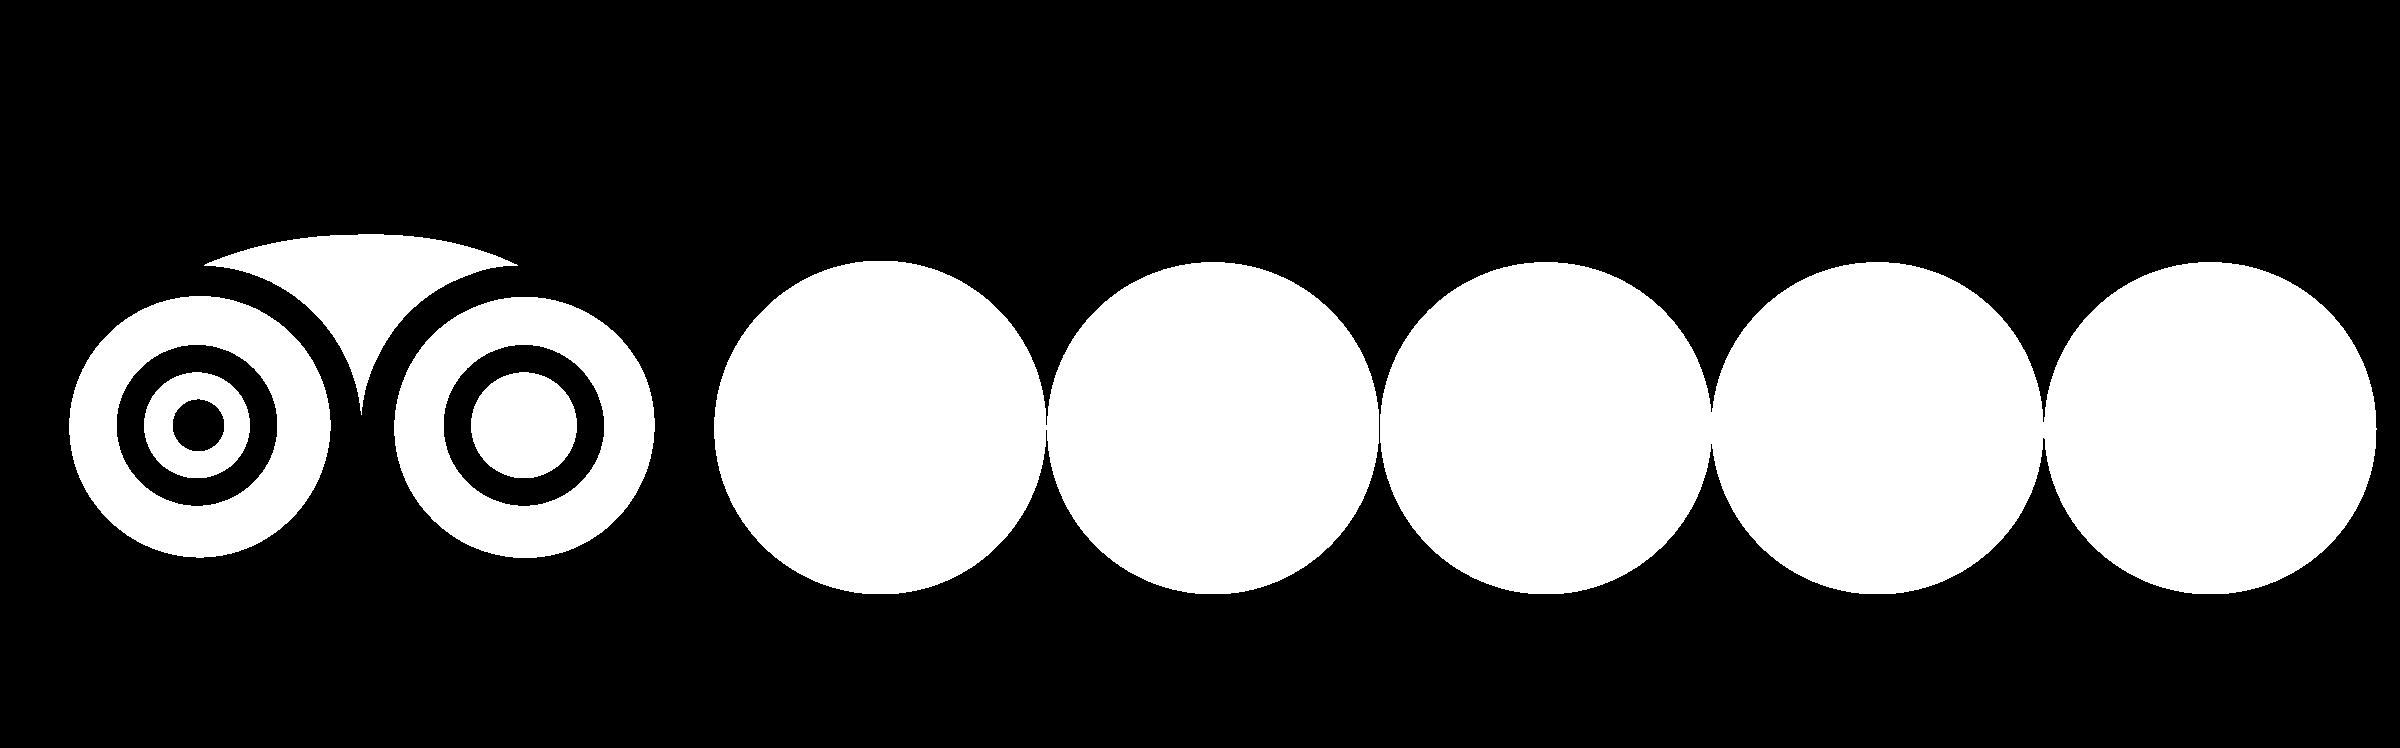 Tripadvisor Logo PNG Transparent SVG Vector